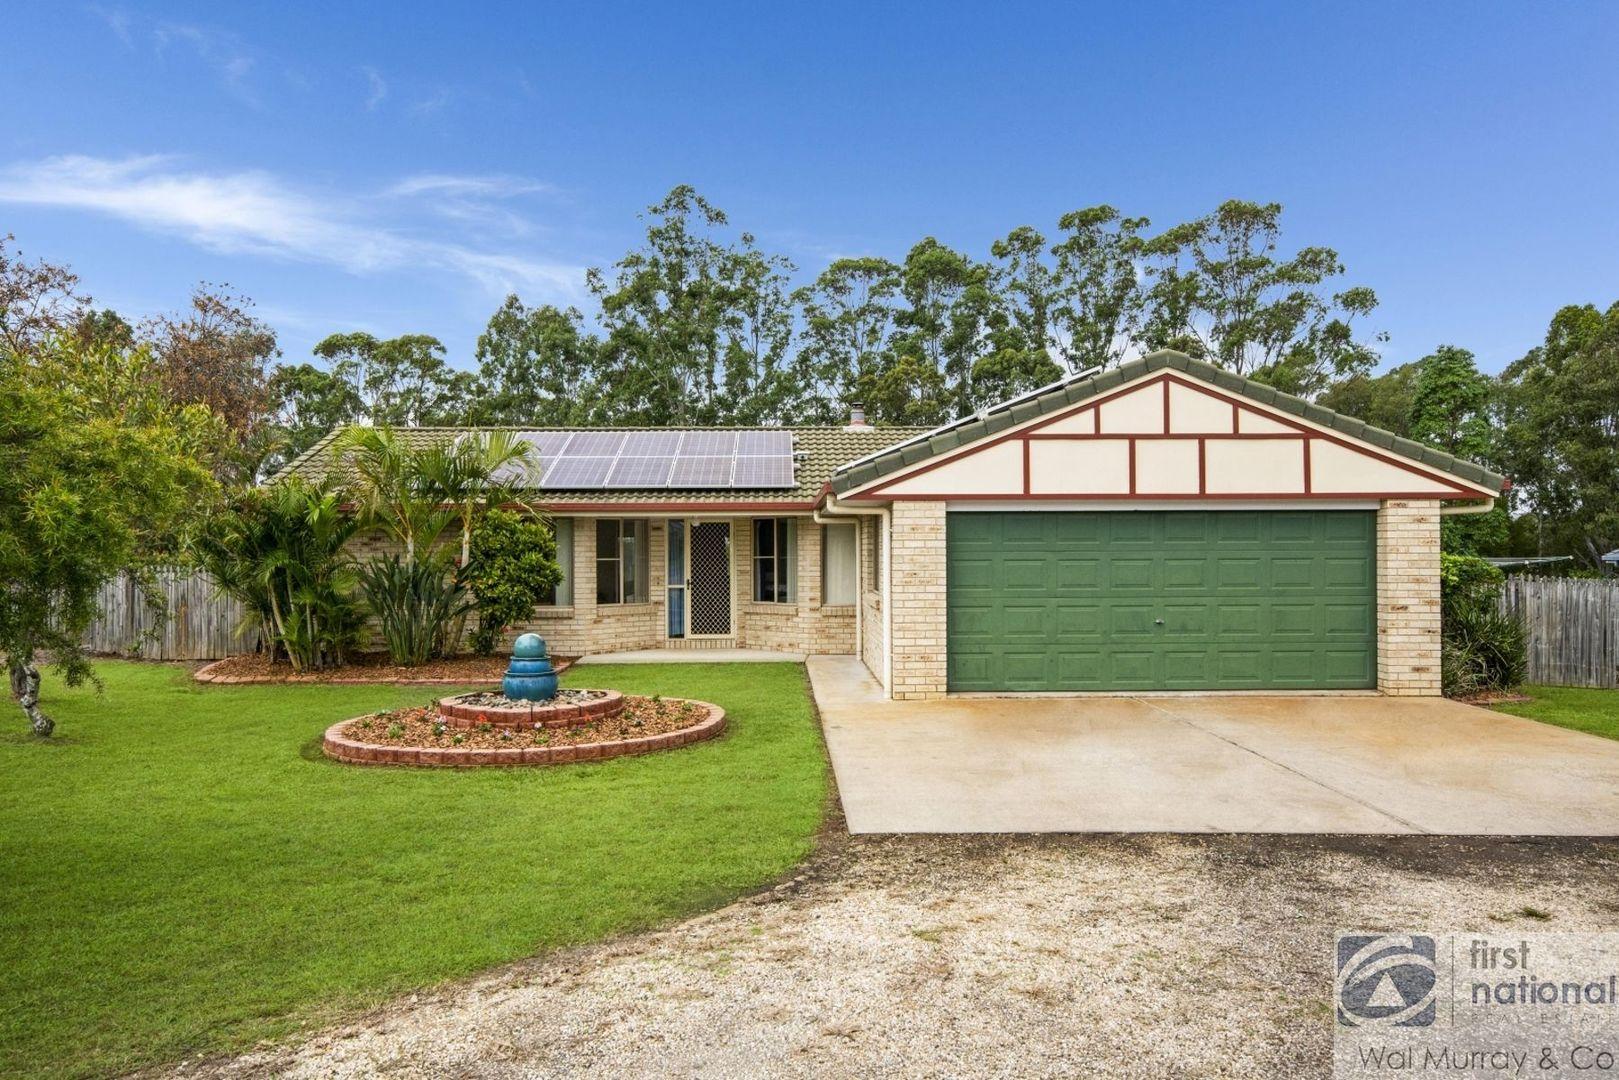 11 Rodeo Drive, North Casino NSW 2470, Image 0